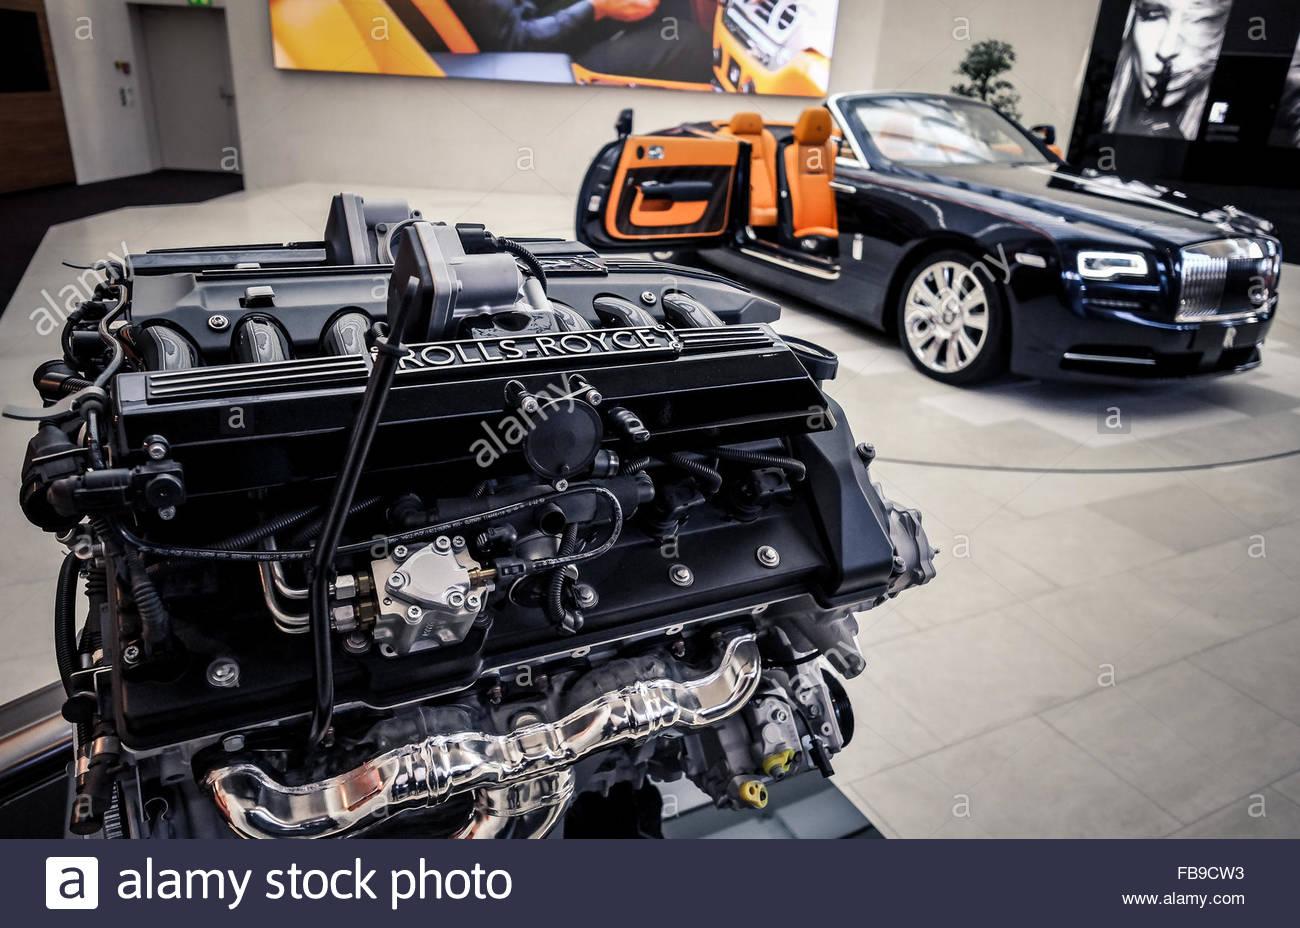 Rolls Royce car limousine - Stock Image